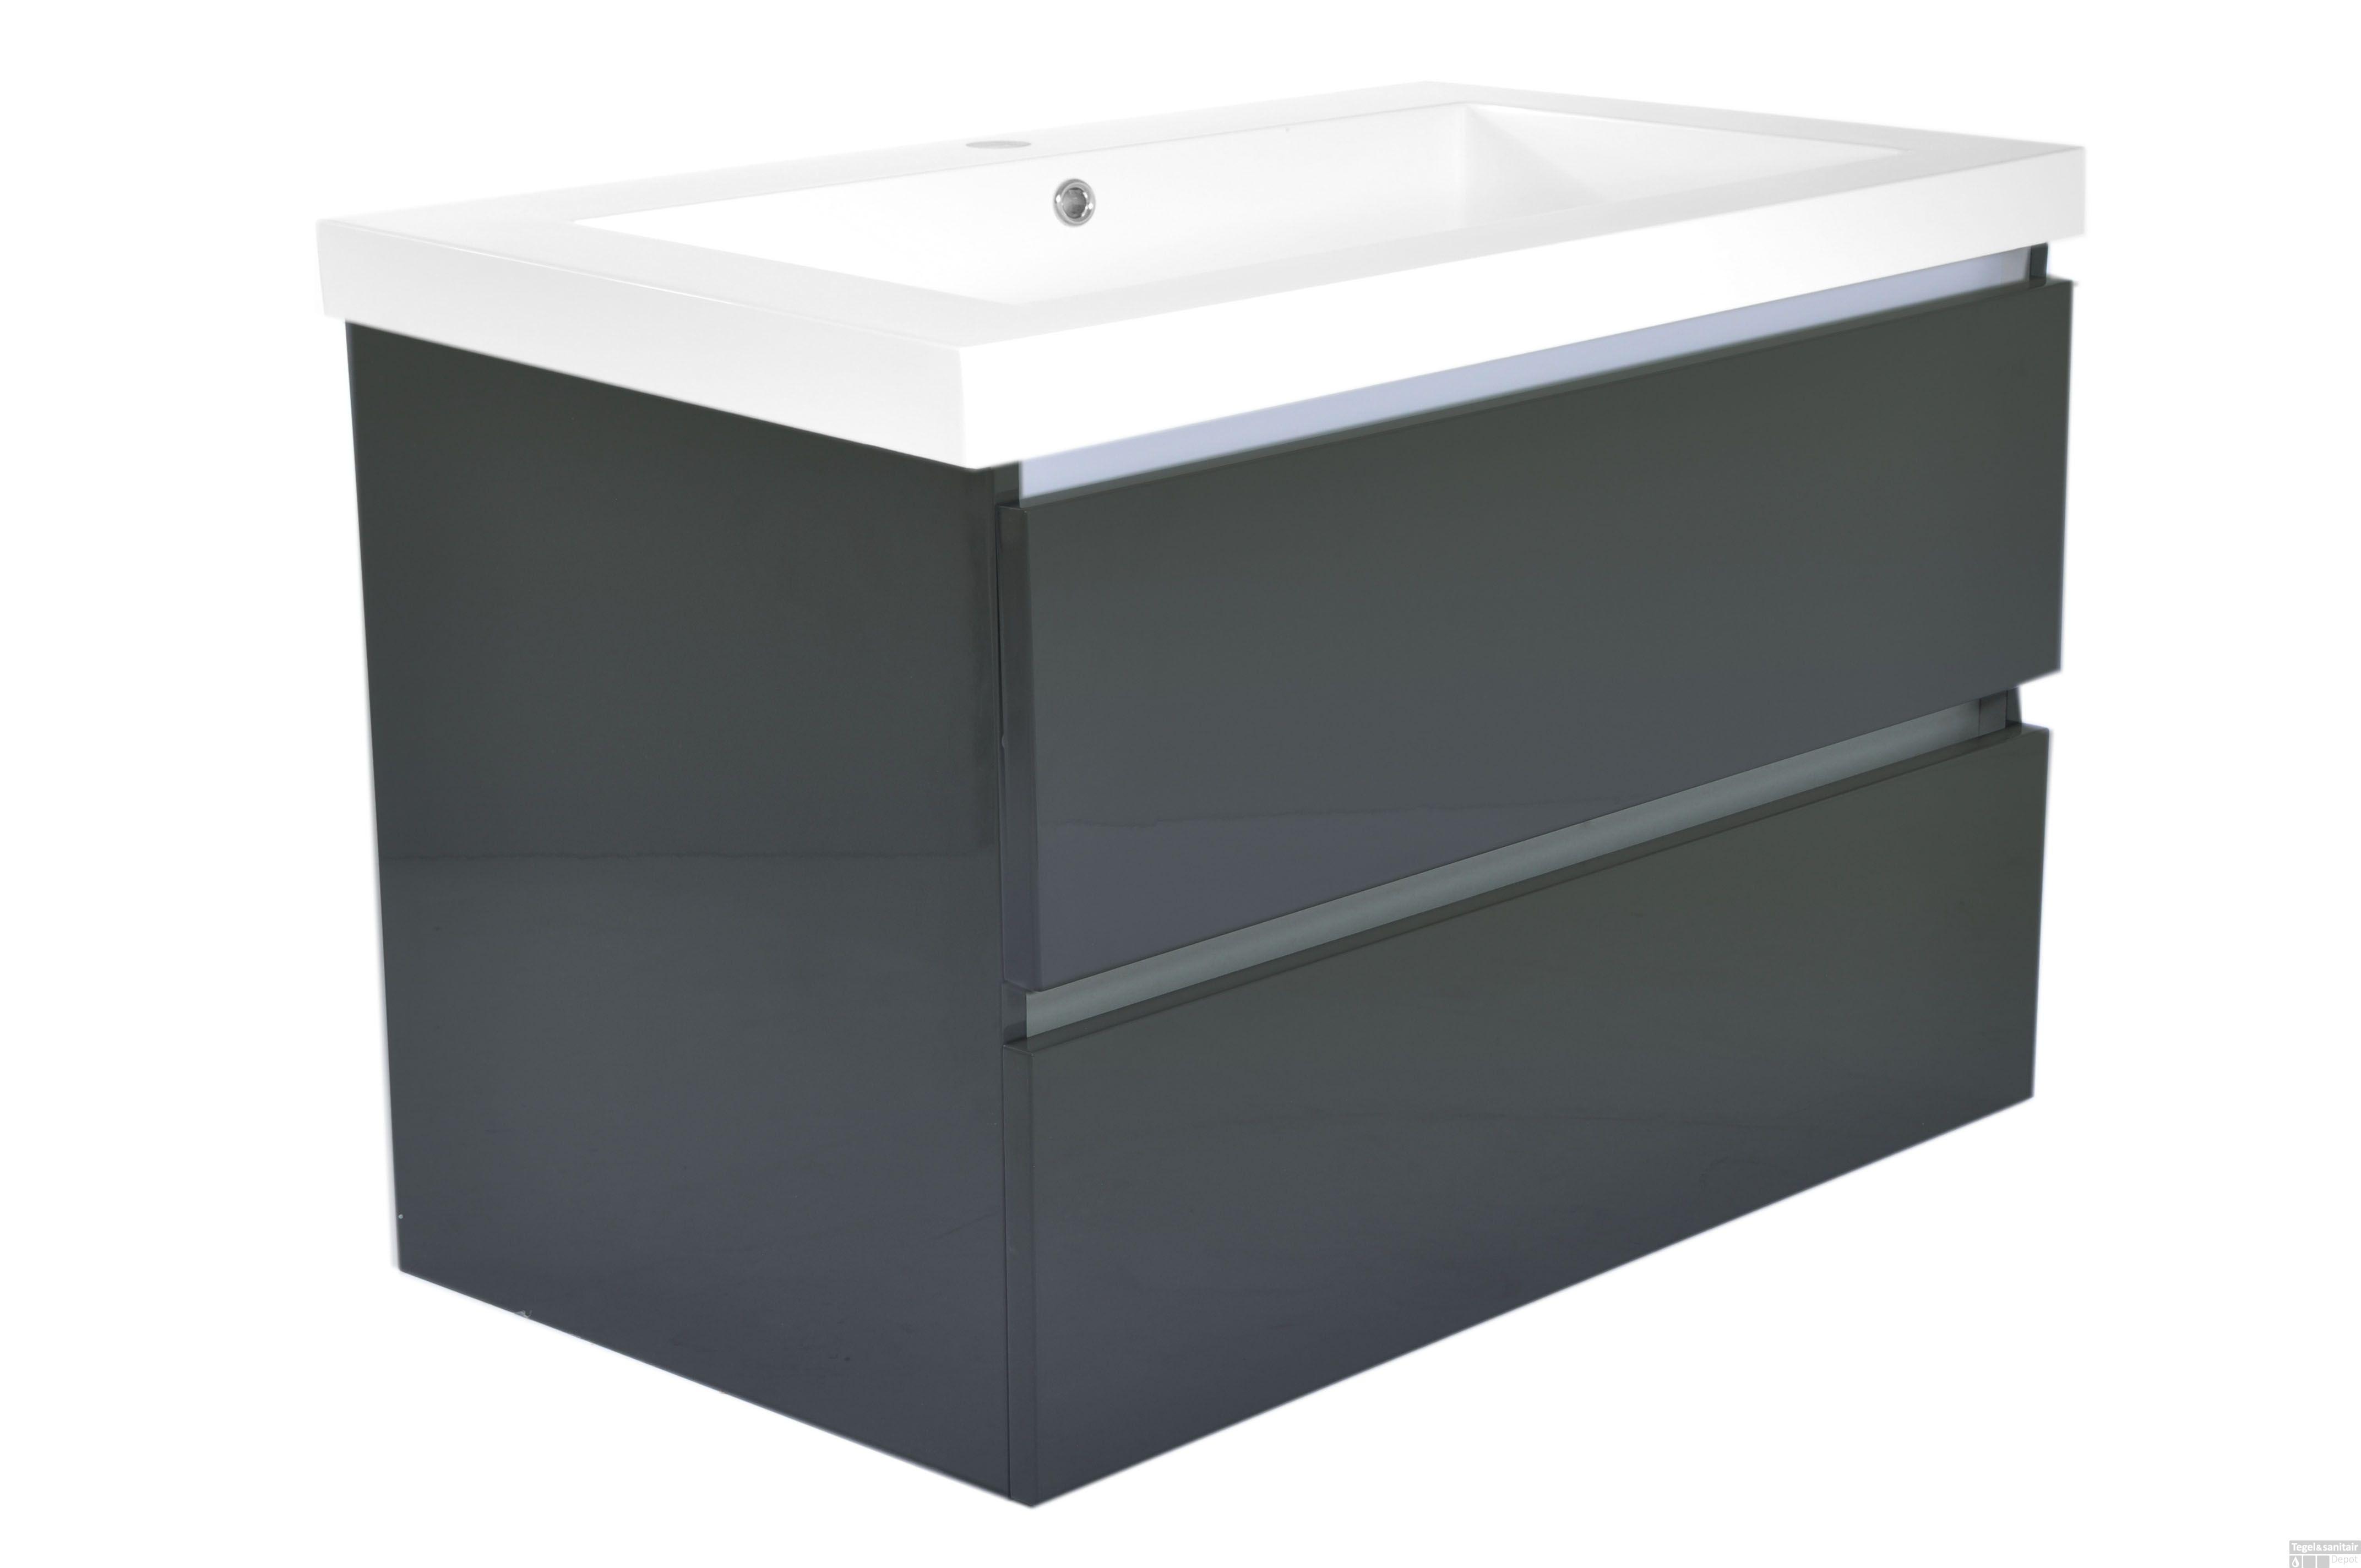 Badkamermeubel wiesbaden vision 80x47 hoogglans grijs met wastafel